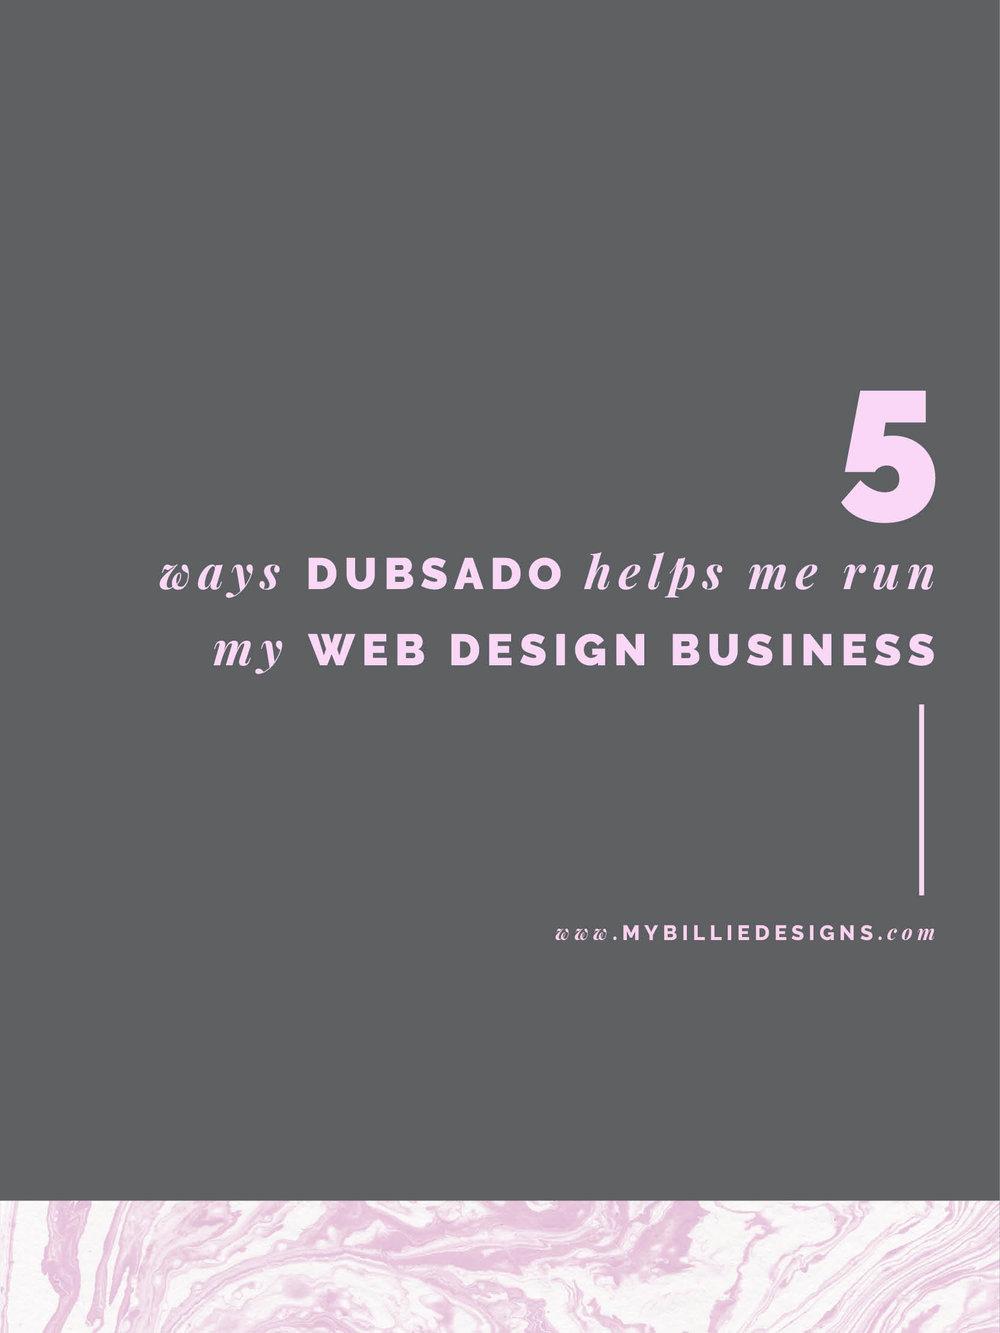 5 Ways Dubsado Helps Me Run My Web Design Business